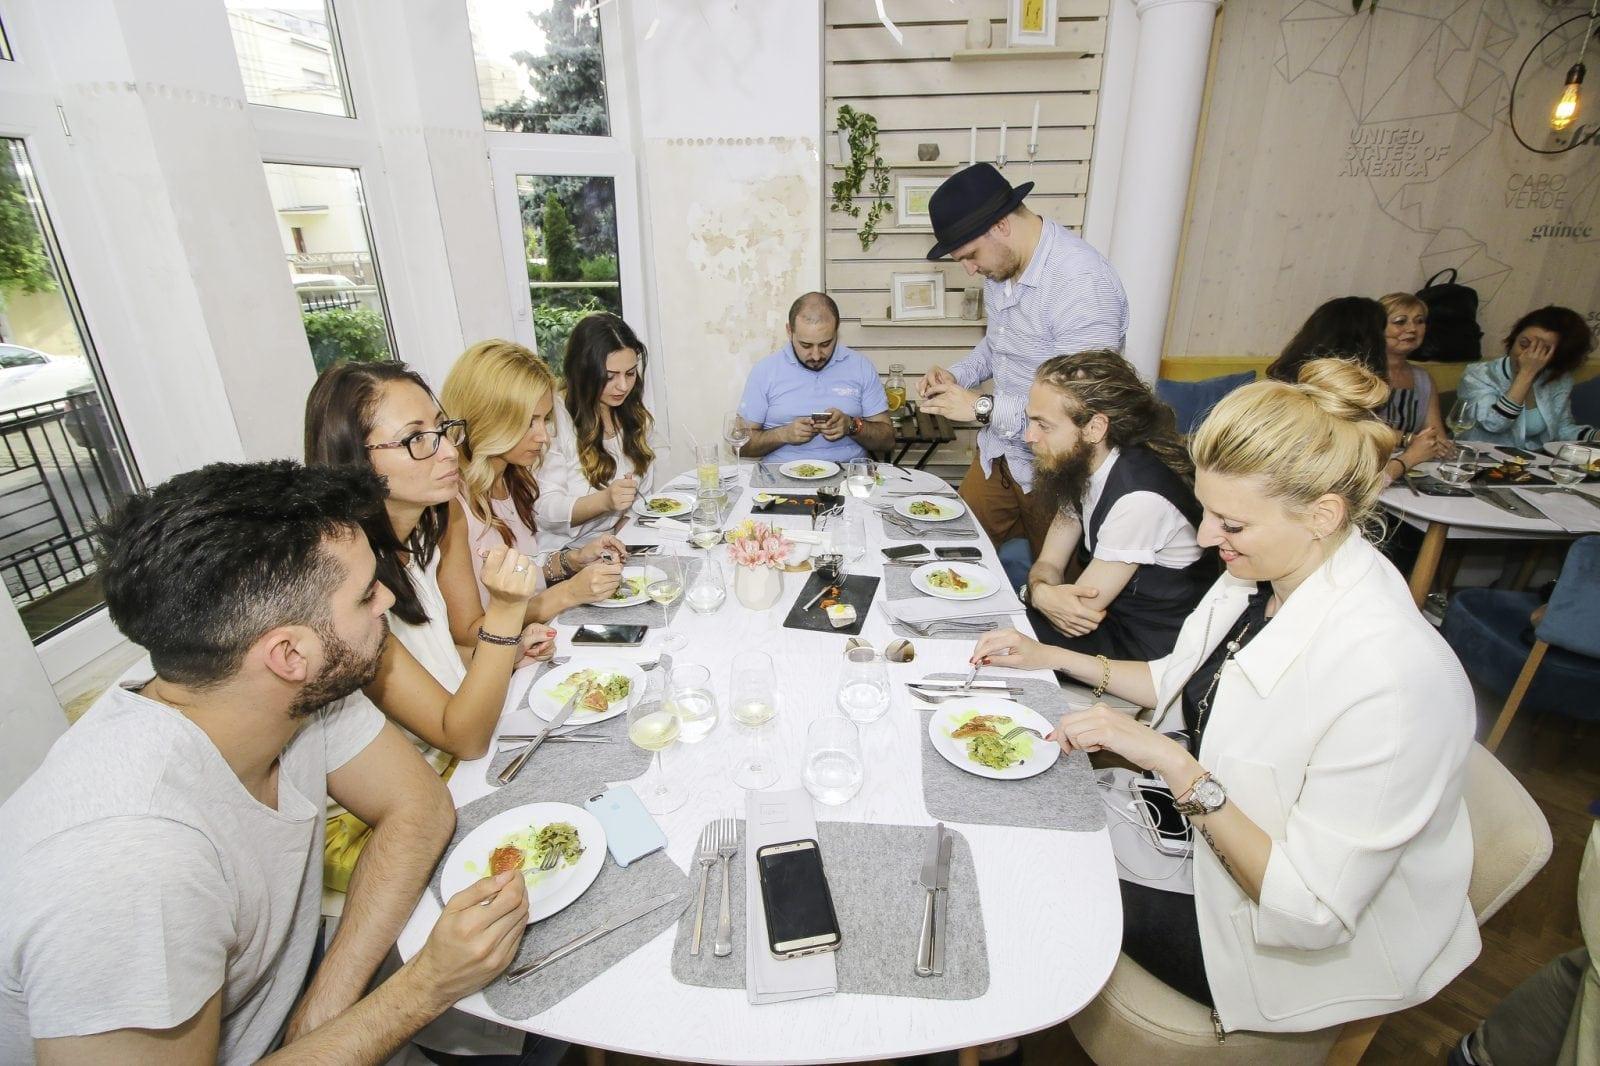 zlrized 3776 - Media Lunch la NORMA Fine Dining cu chef Sidia Sissoko